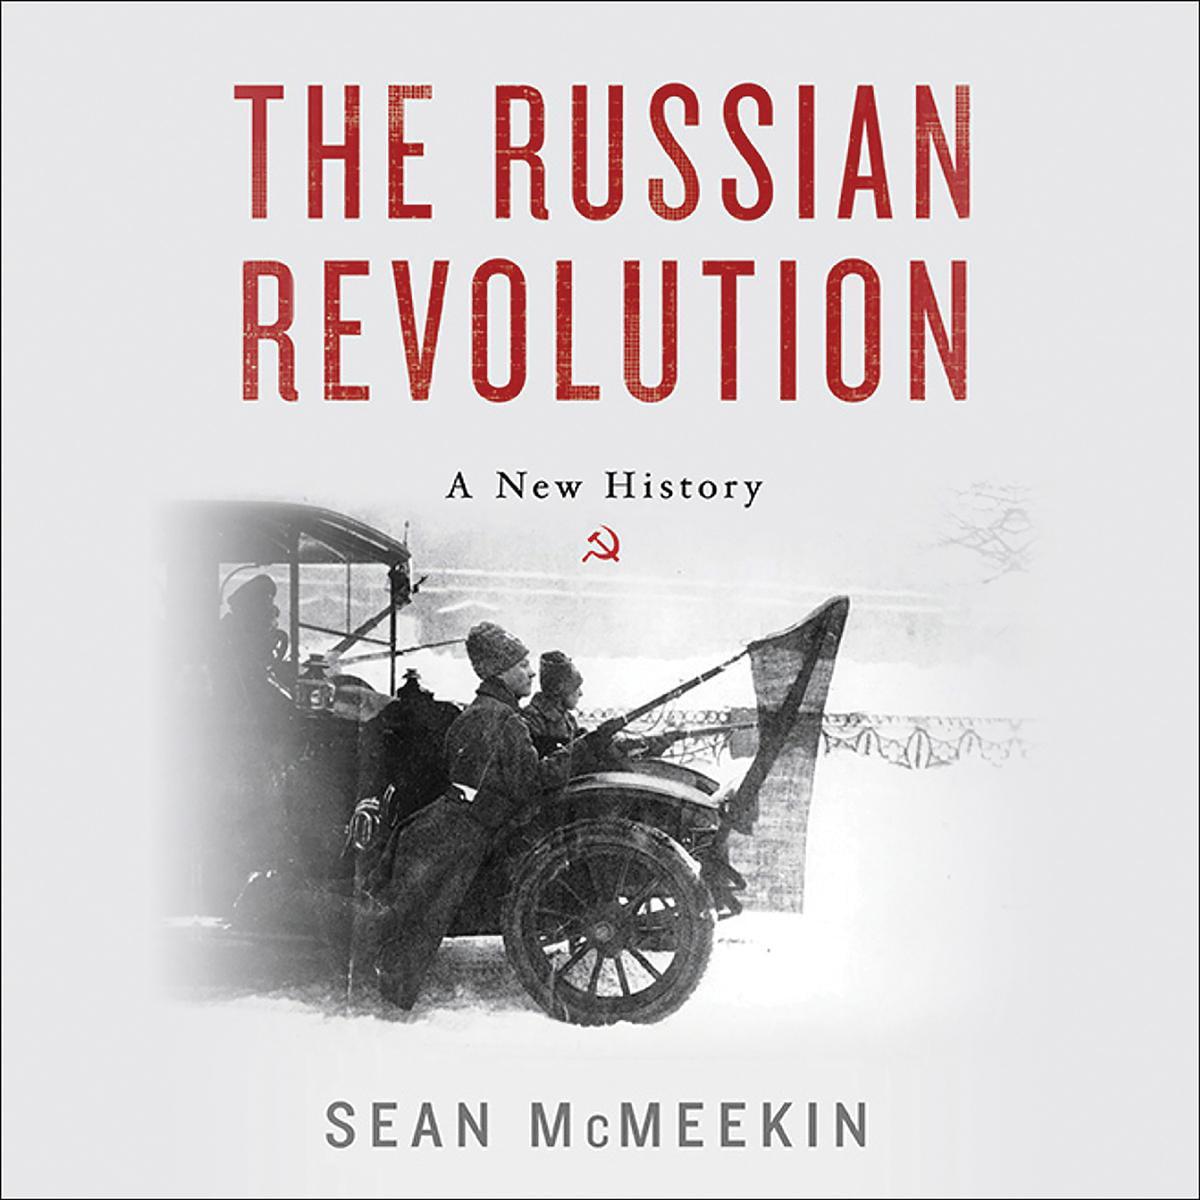 The Russian Revolution - Audiobook